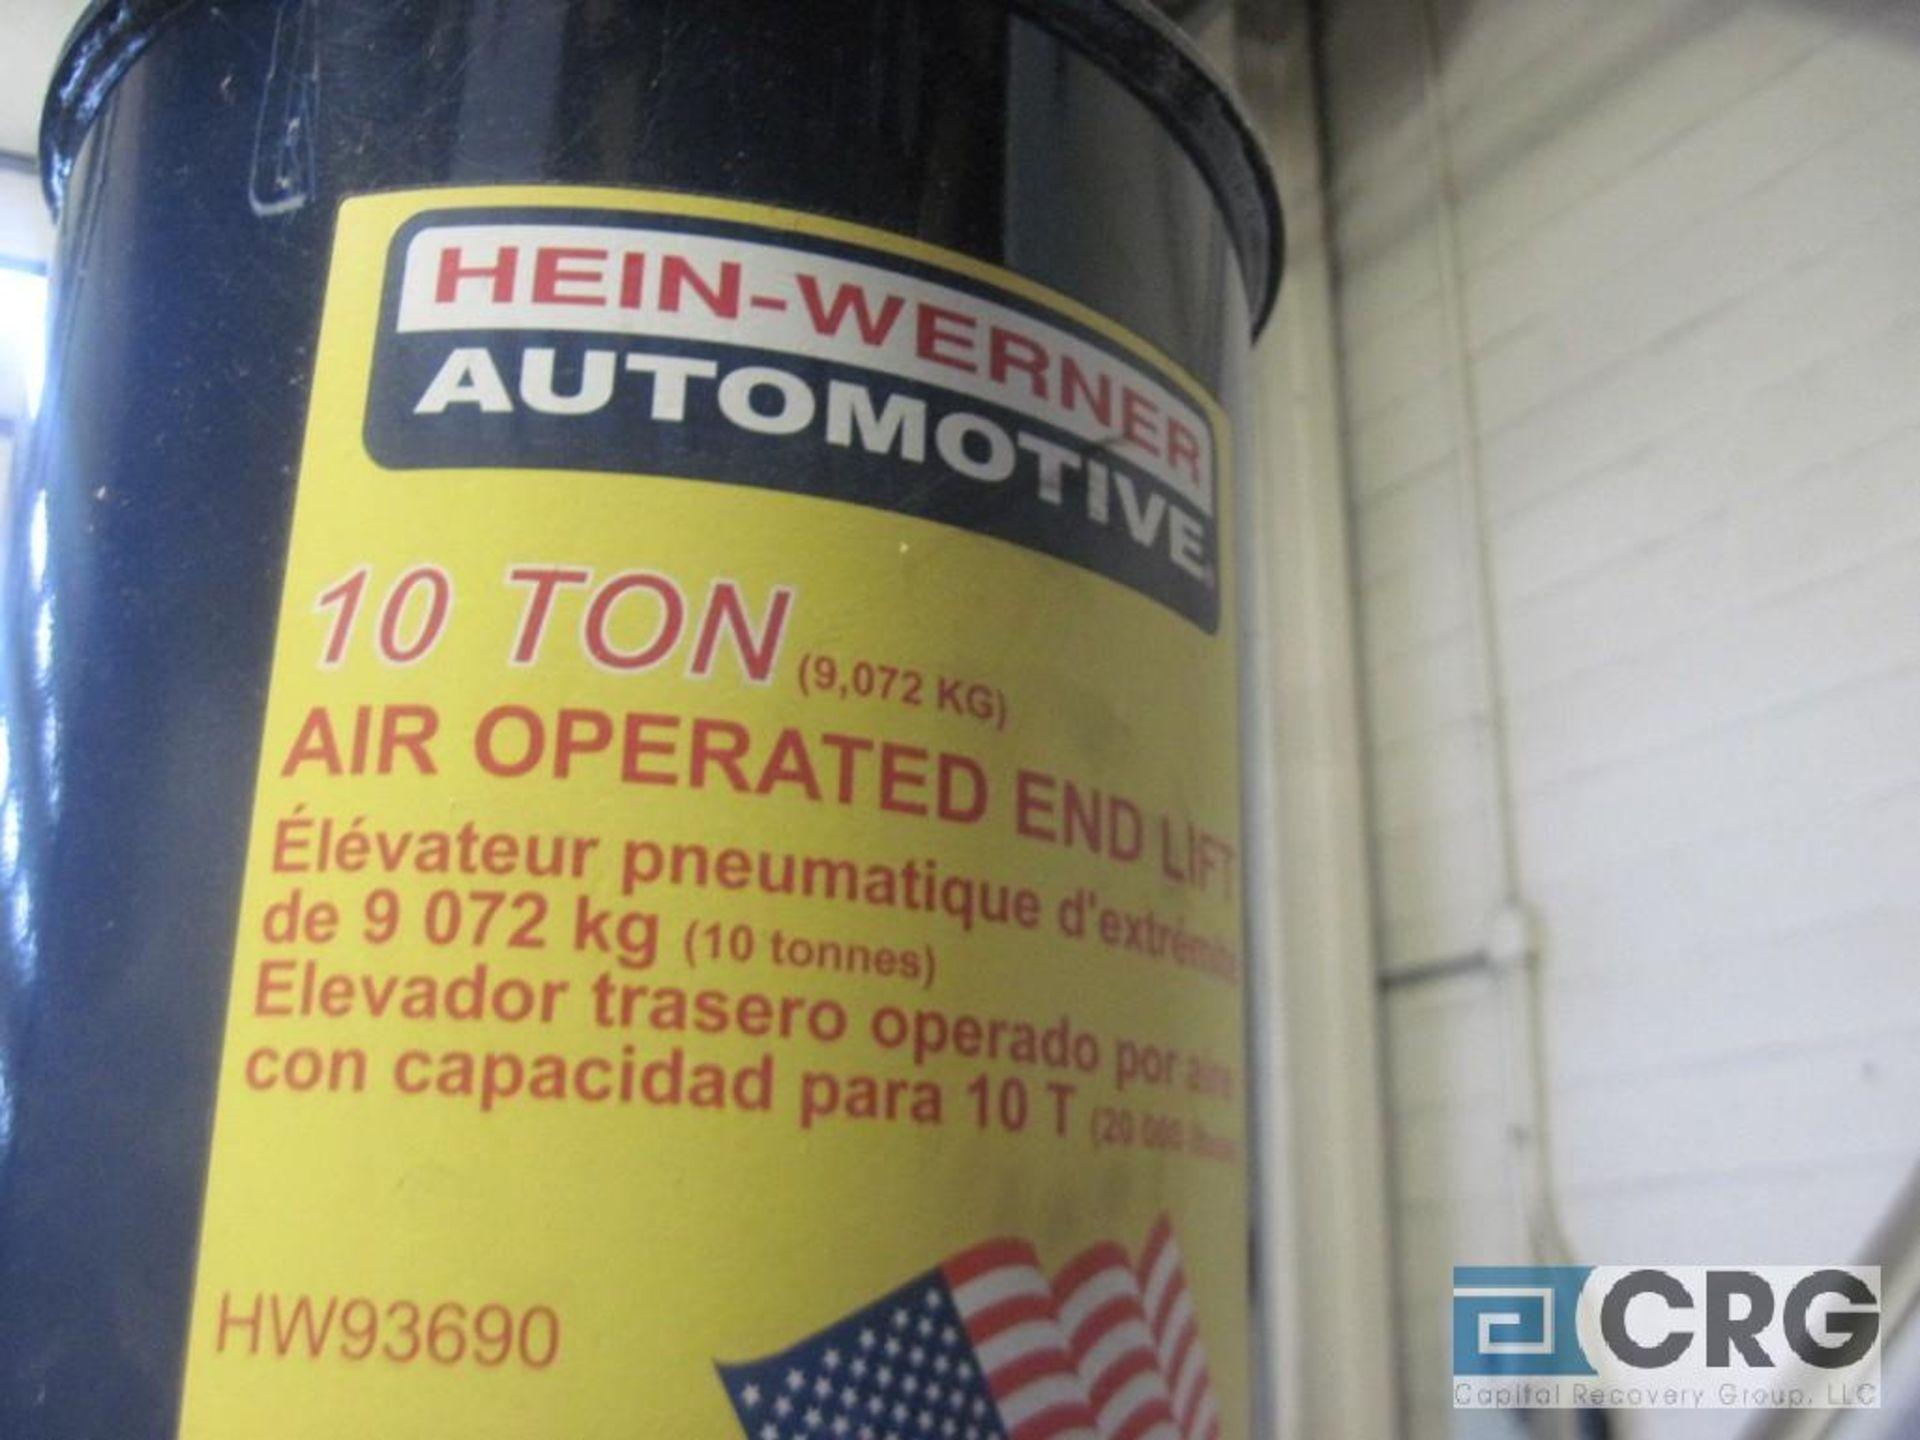 Hein Warner HW 93690 pneumatic truck lift, 10 ton cap., 13 1/2 58 1/2 H. range - Image 2 of 2